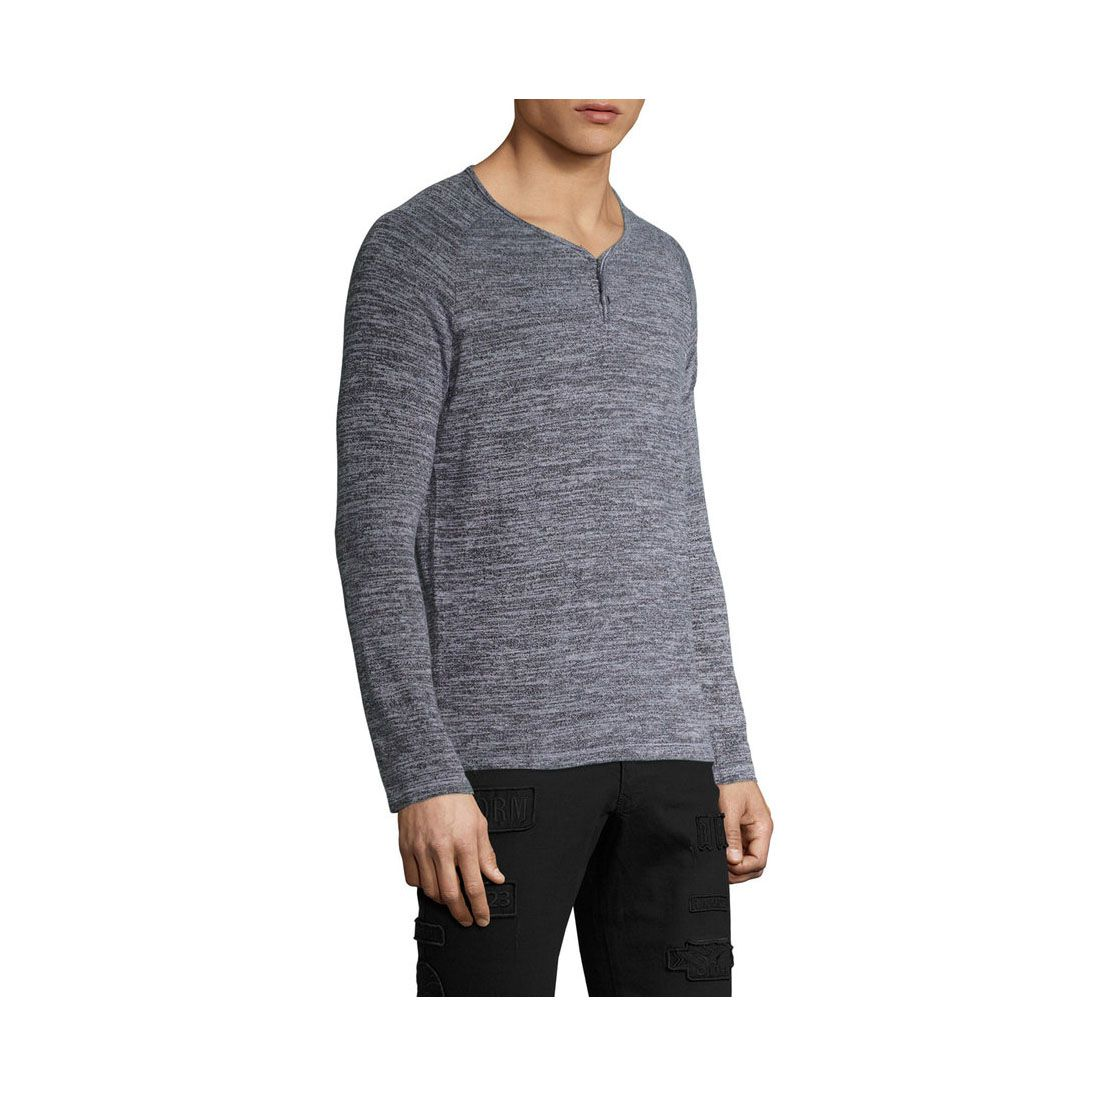 Geenoo Grey Round T-Shirt Pack of 1